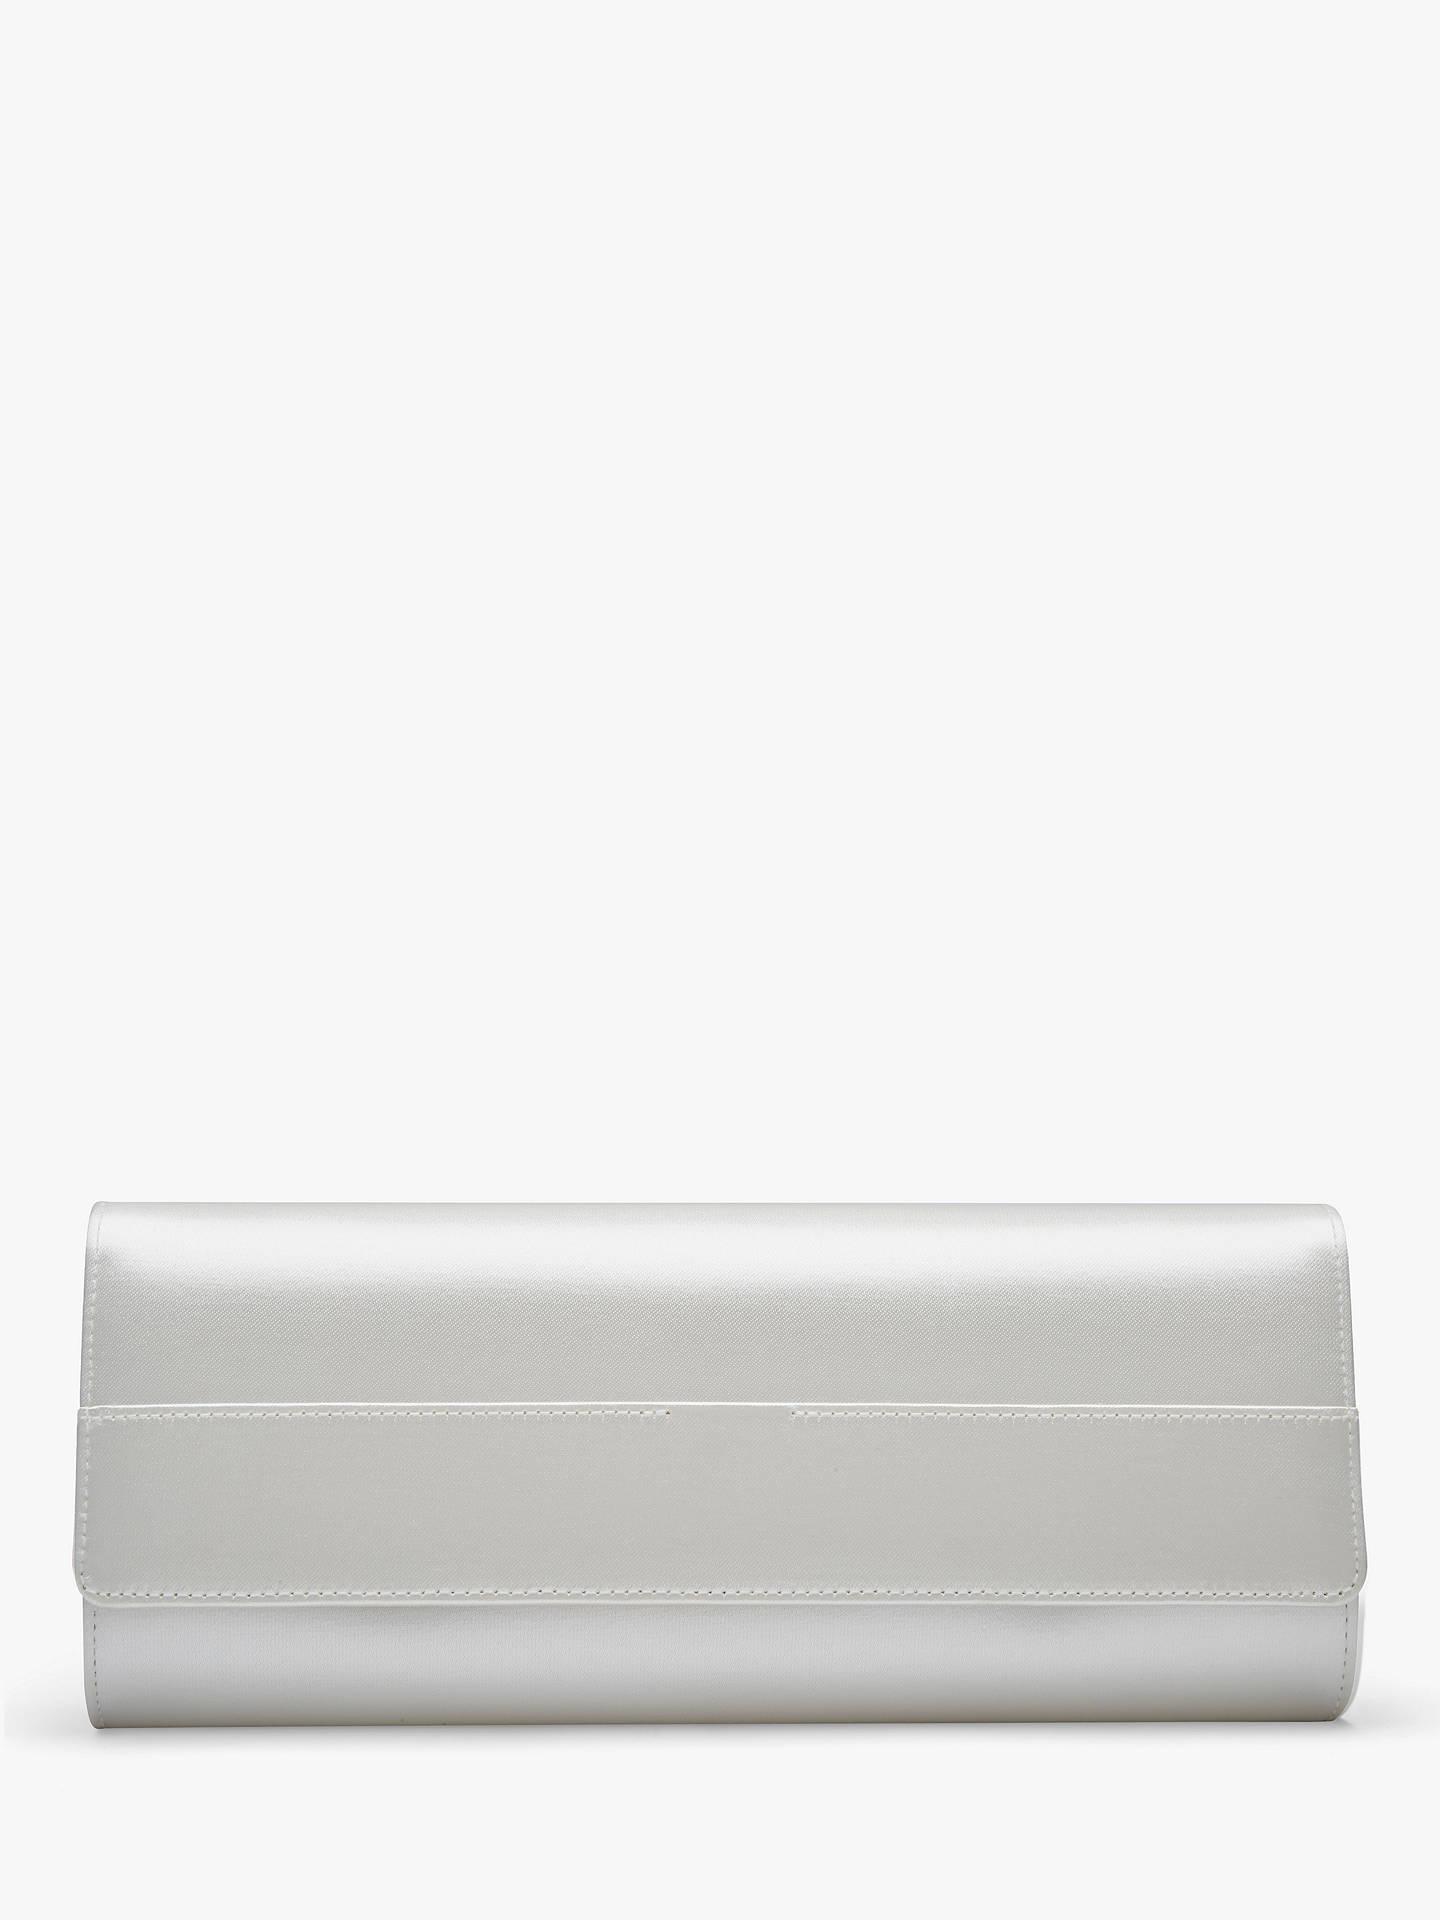 6a43d40635 Buy Rainbow Club Greta Satin Clutch Bag, Ivory Online at johnlewis.com ...